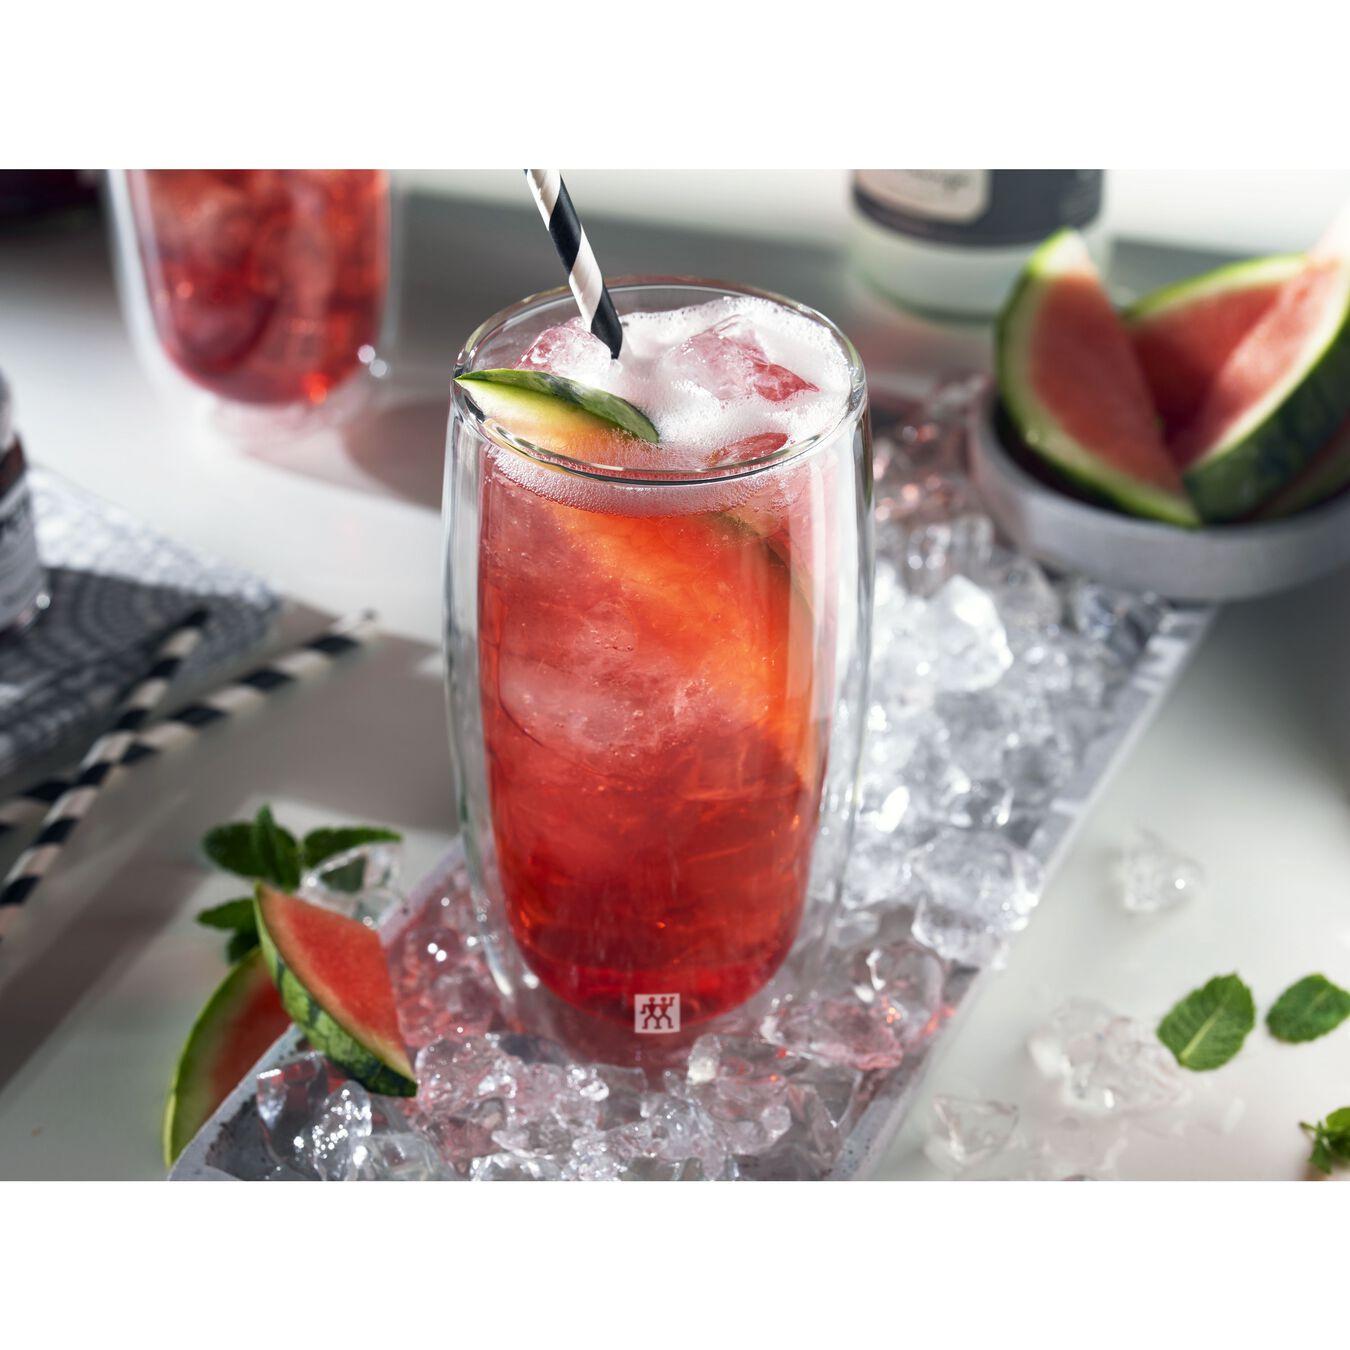 Set di bicchieri da softdrink - 2-pz., vetro borosilicato,,large 2